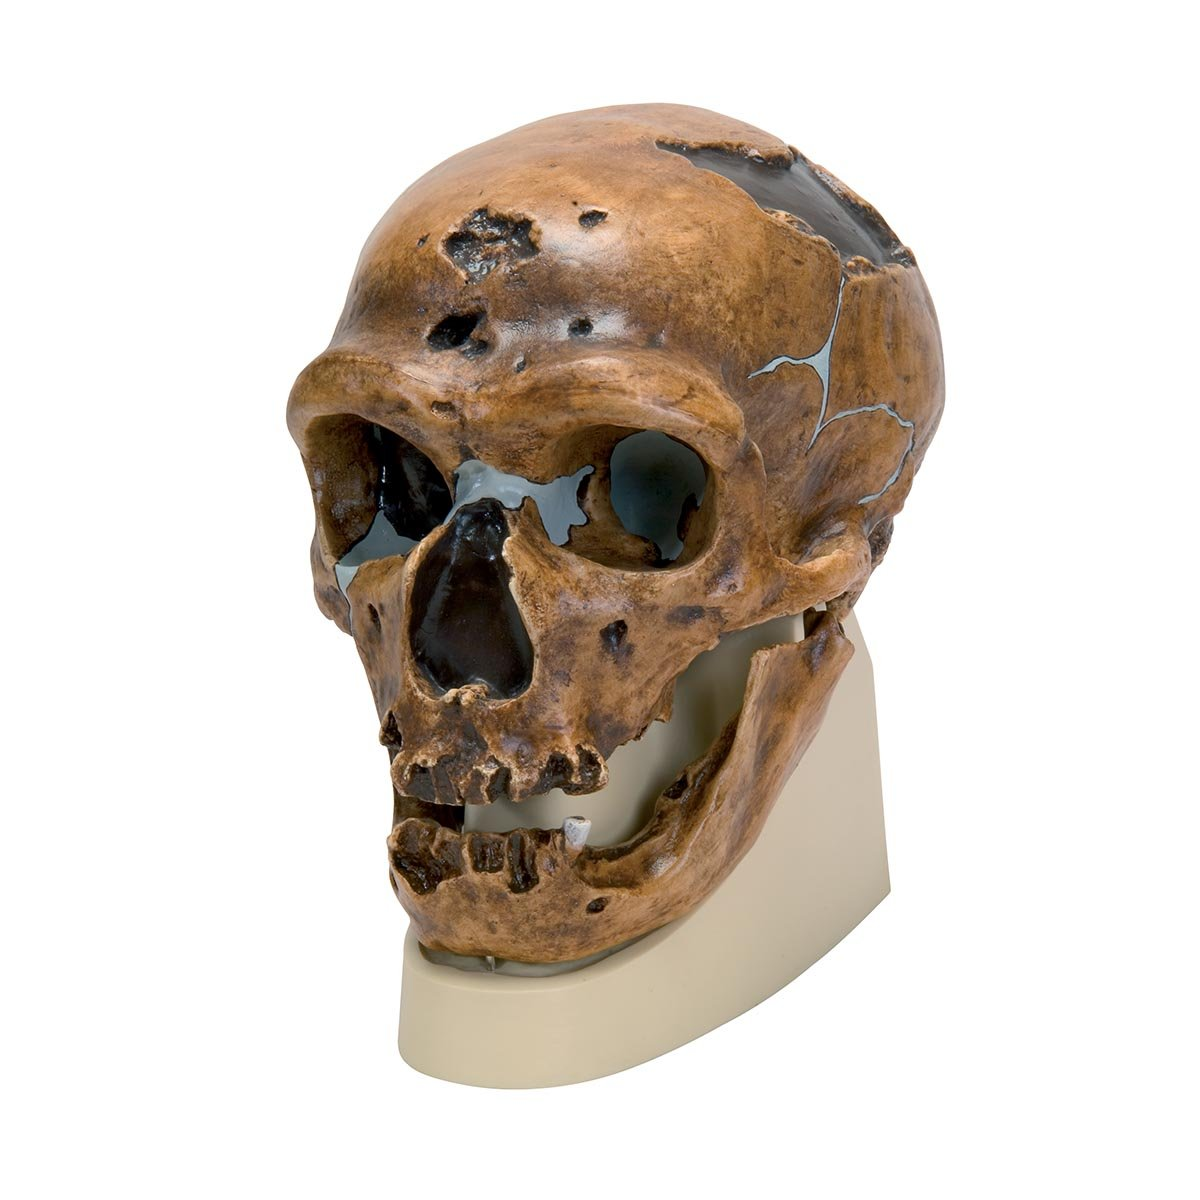 3B Scientific VP751/1 Ré plica del Crá neo del Homo Neanderthalensis, La Chapelle-Aux-Saints 1 3B Scientific GmbH 1001294 3B  VP751/1